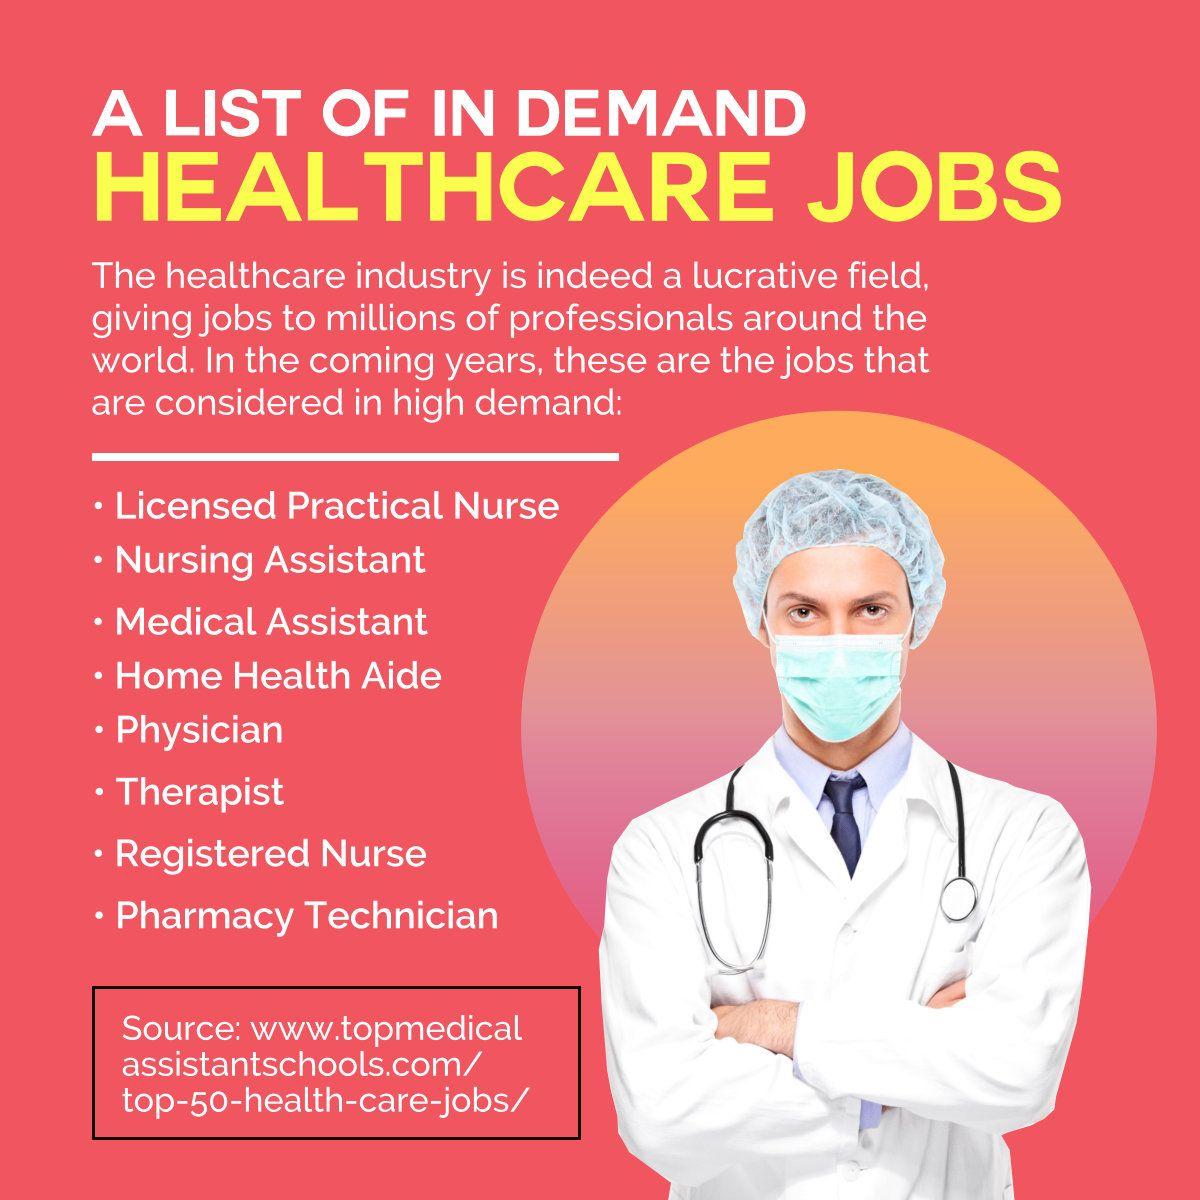 A List of InDemand Healthcare Jobs